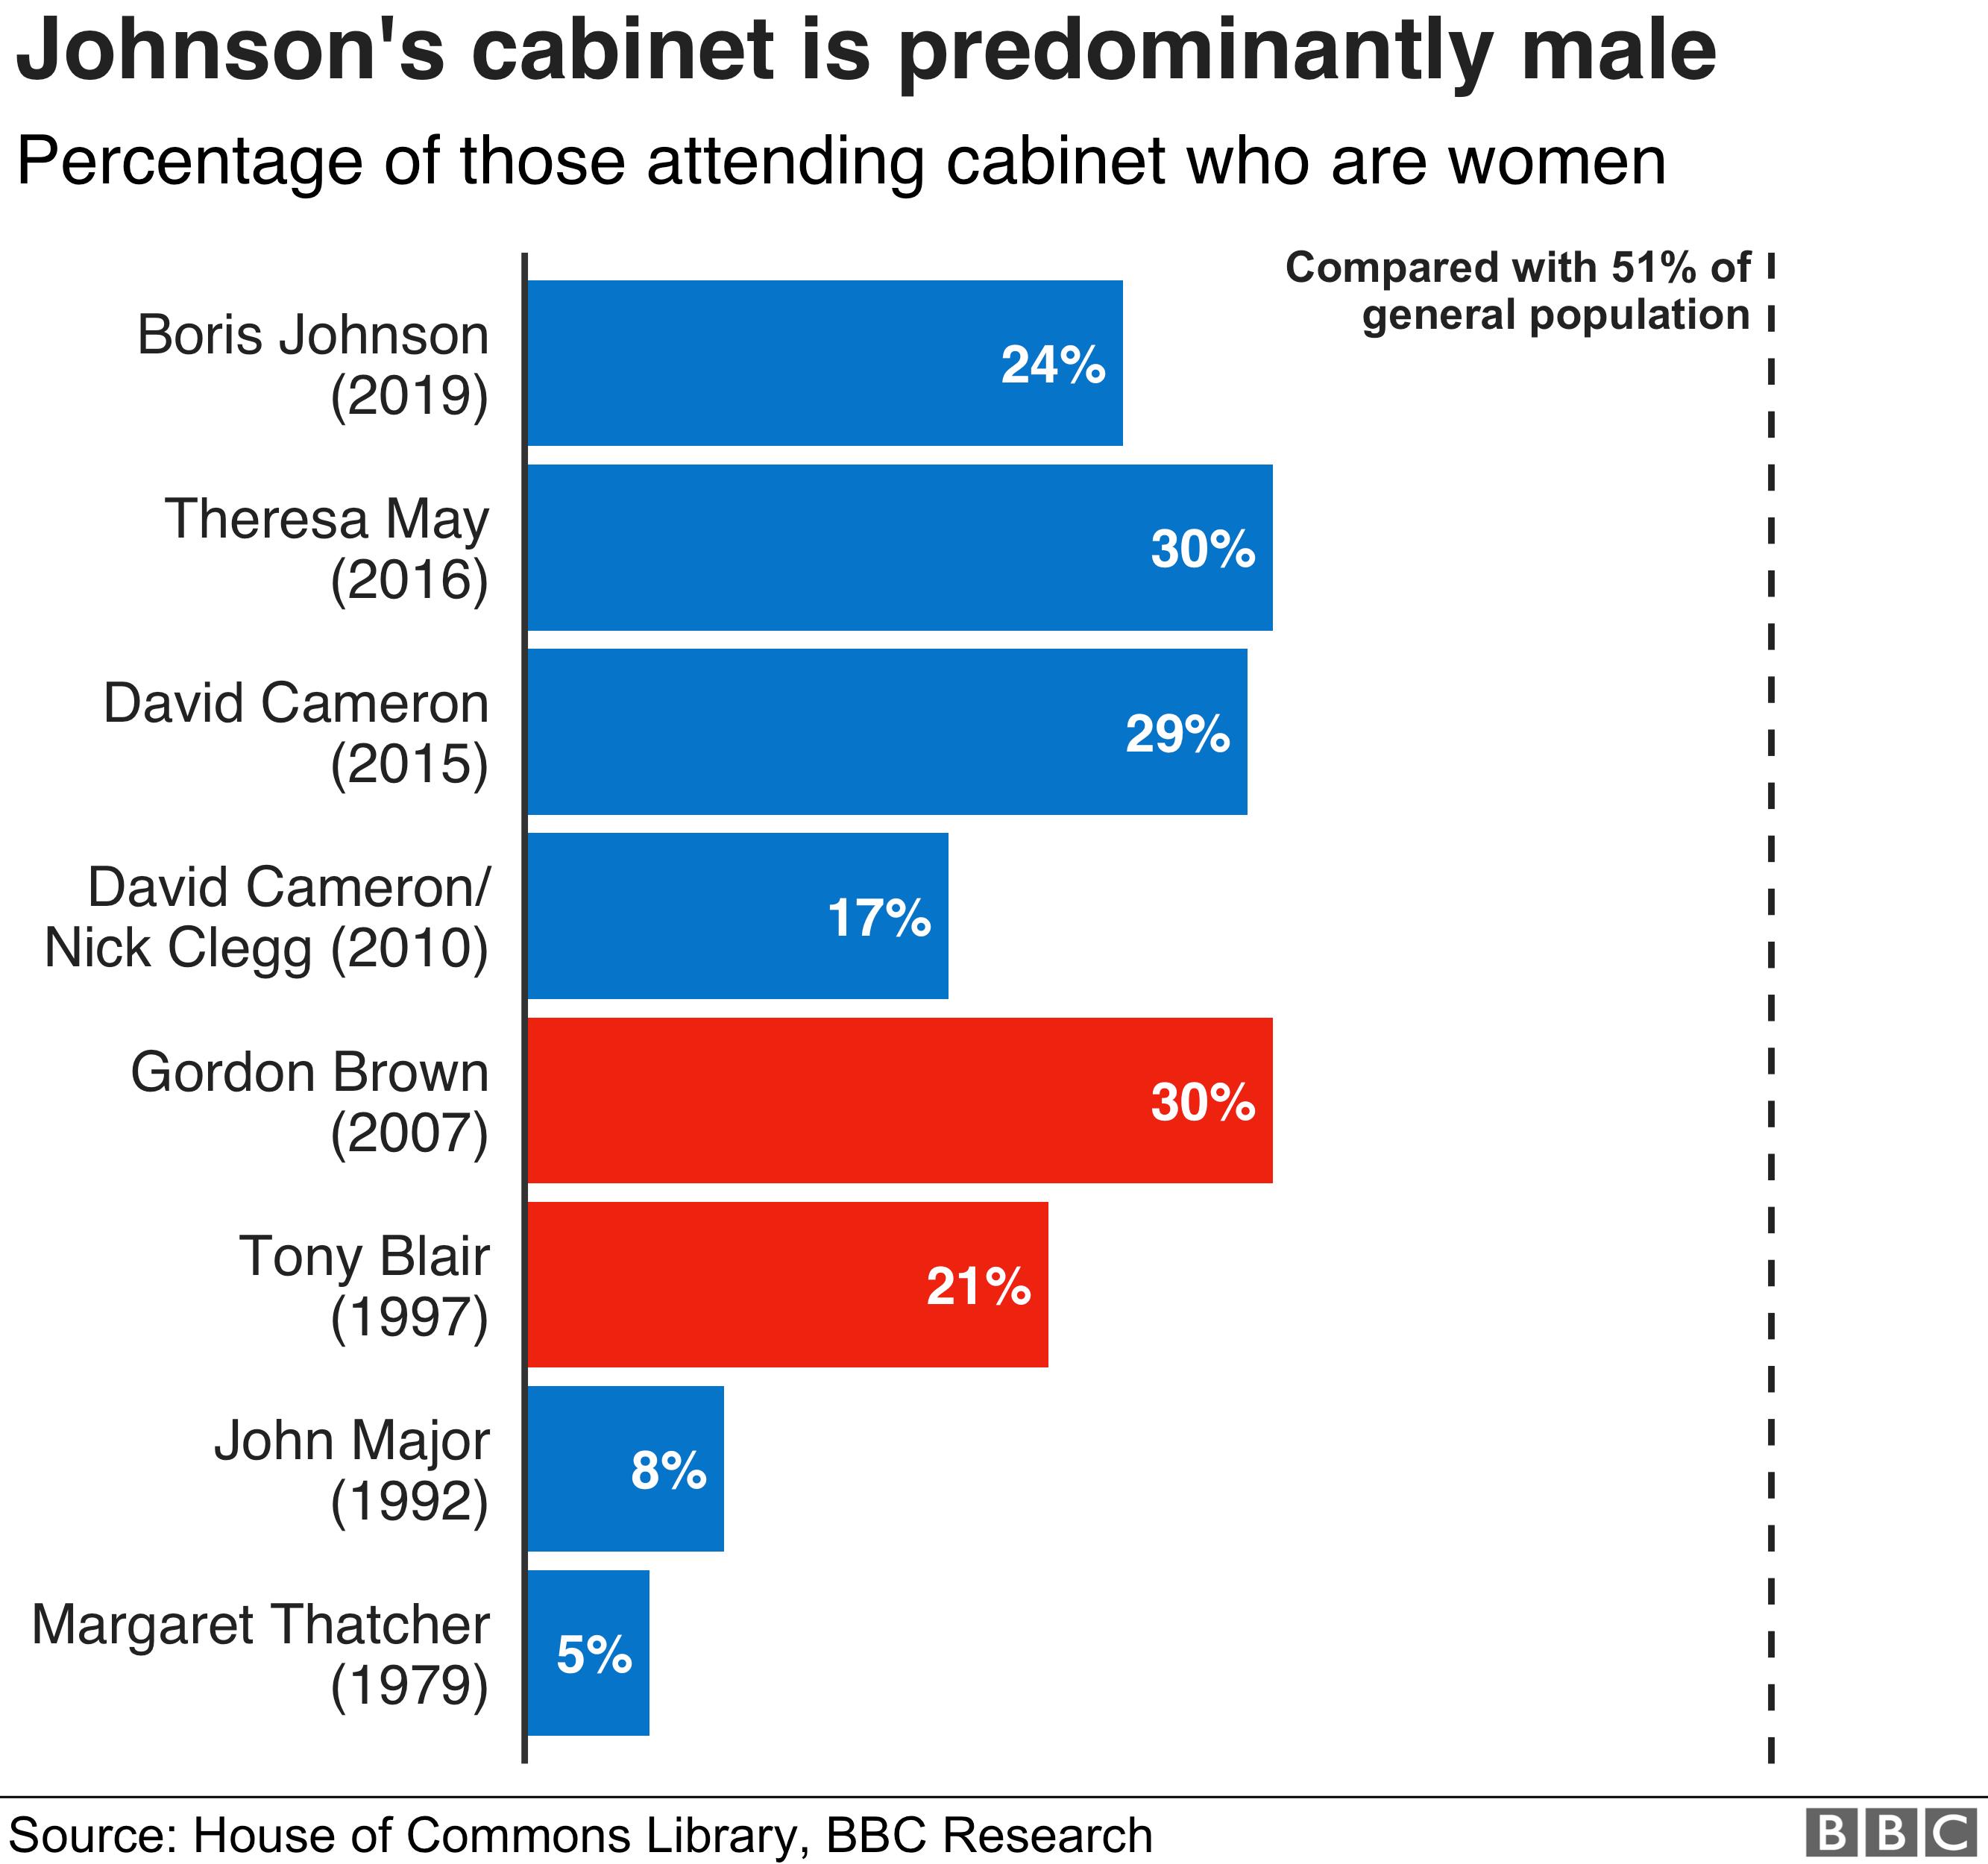 Prime Minister Boris Johnson Does His Cabinet Reflect Modern